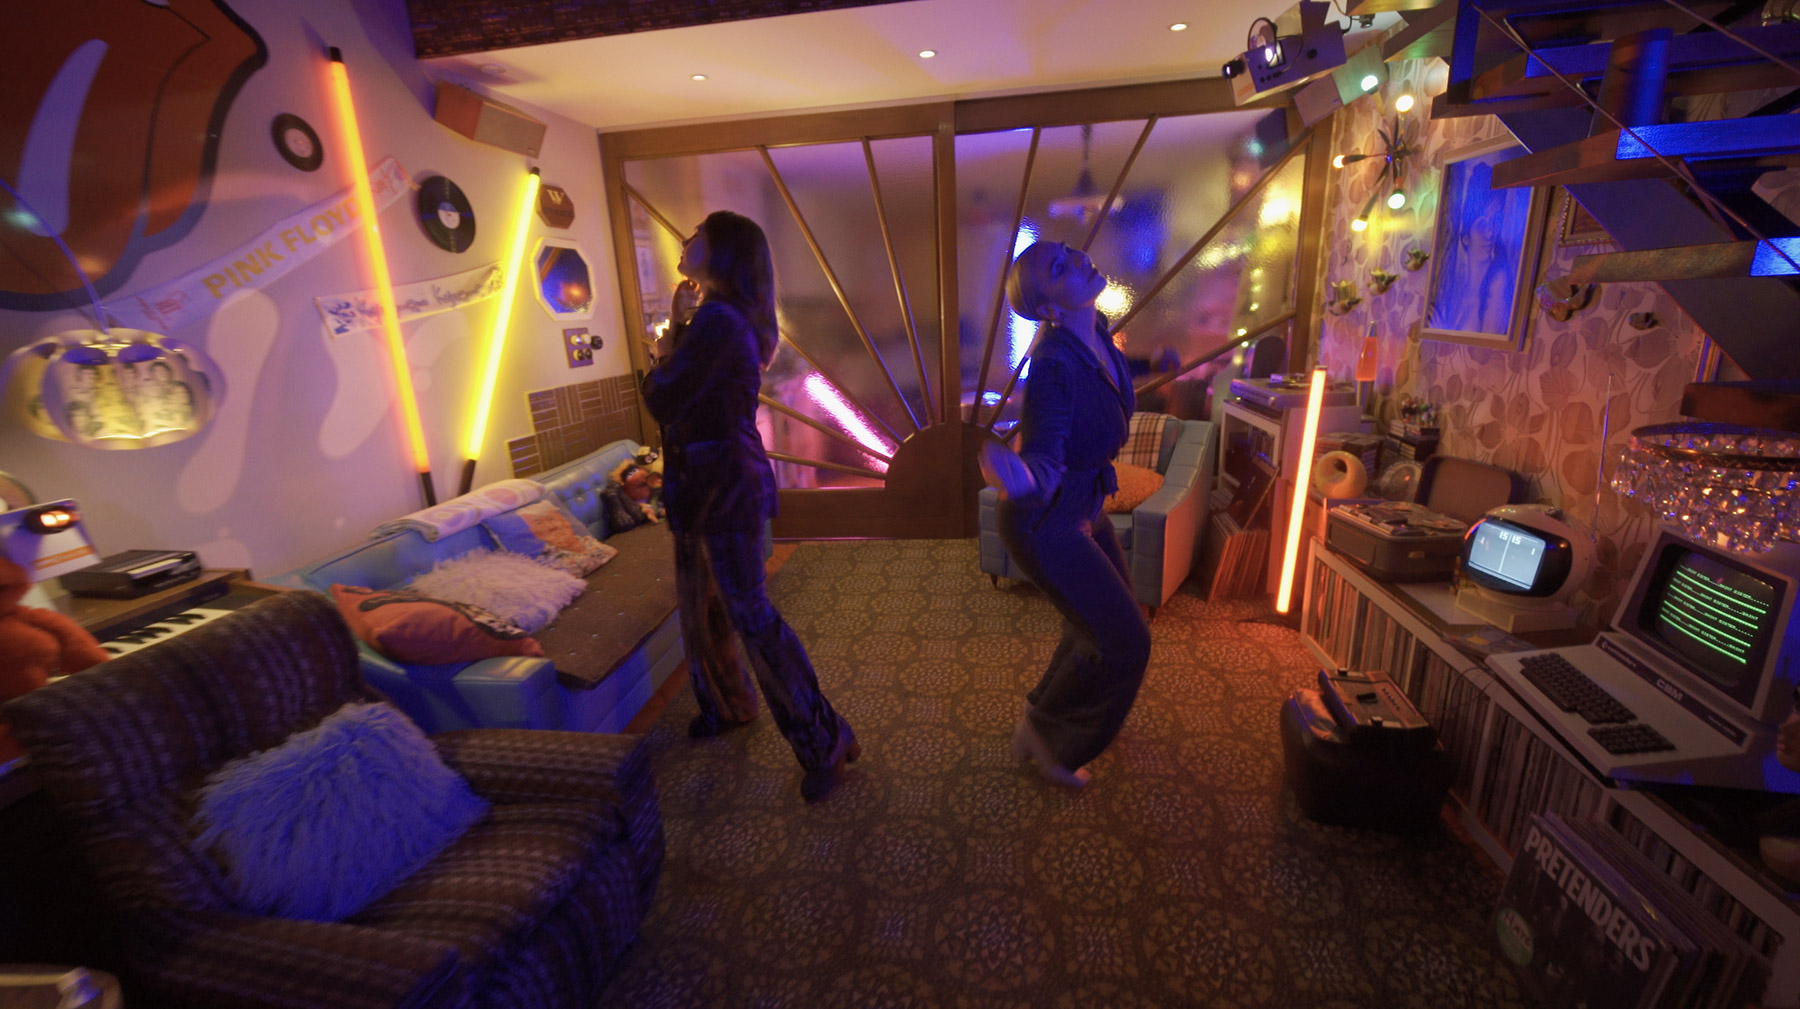 Saint Sister Dancing in room